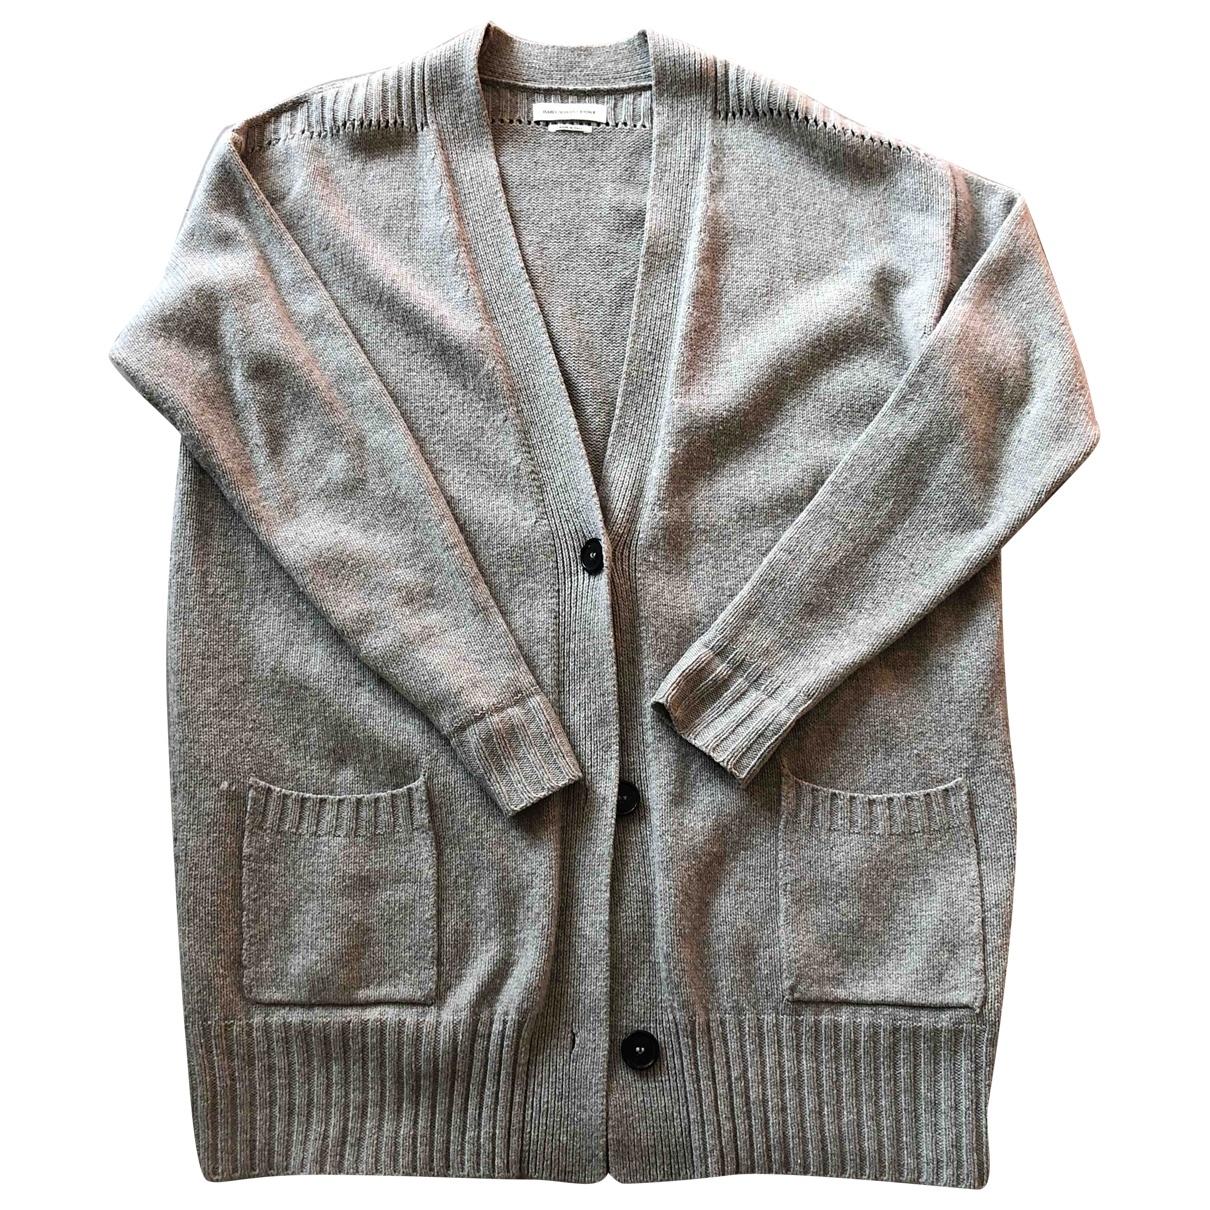 Isabel Marant Etoile N Grey Cashmere Knitwear for Women 38 FR